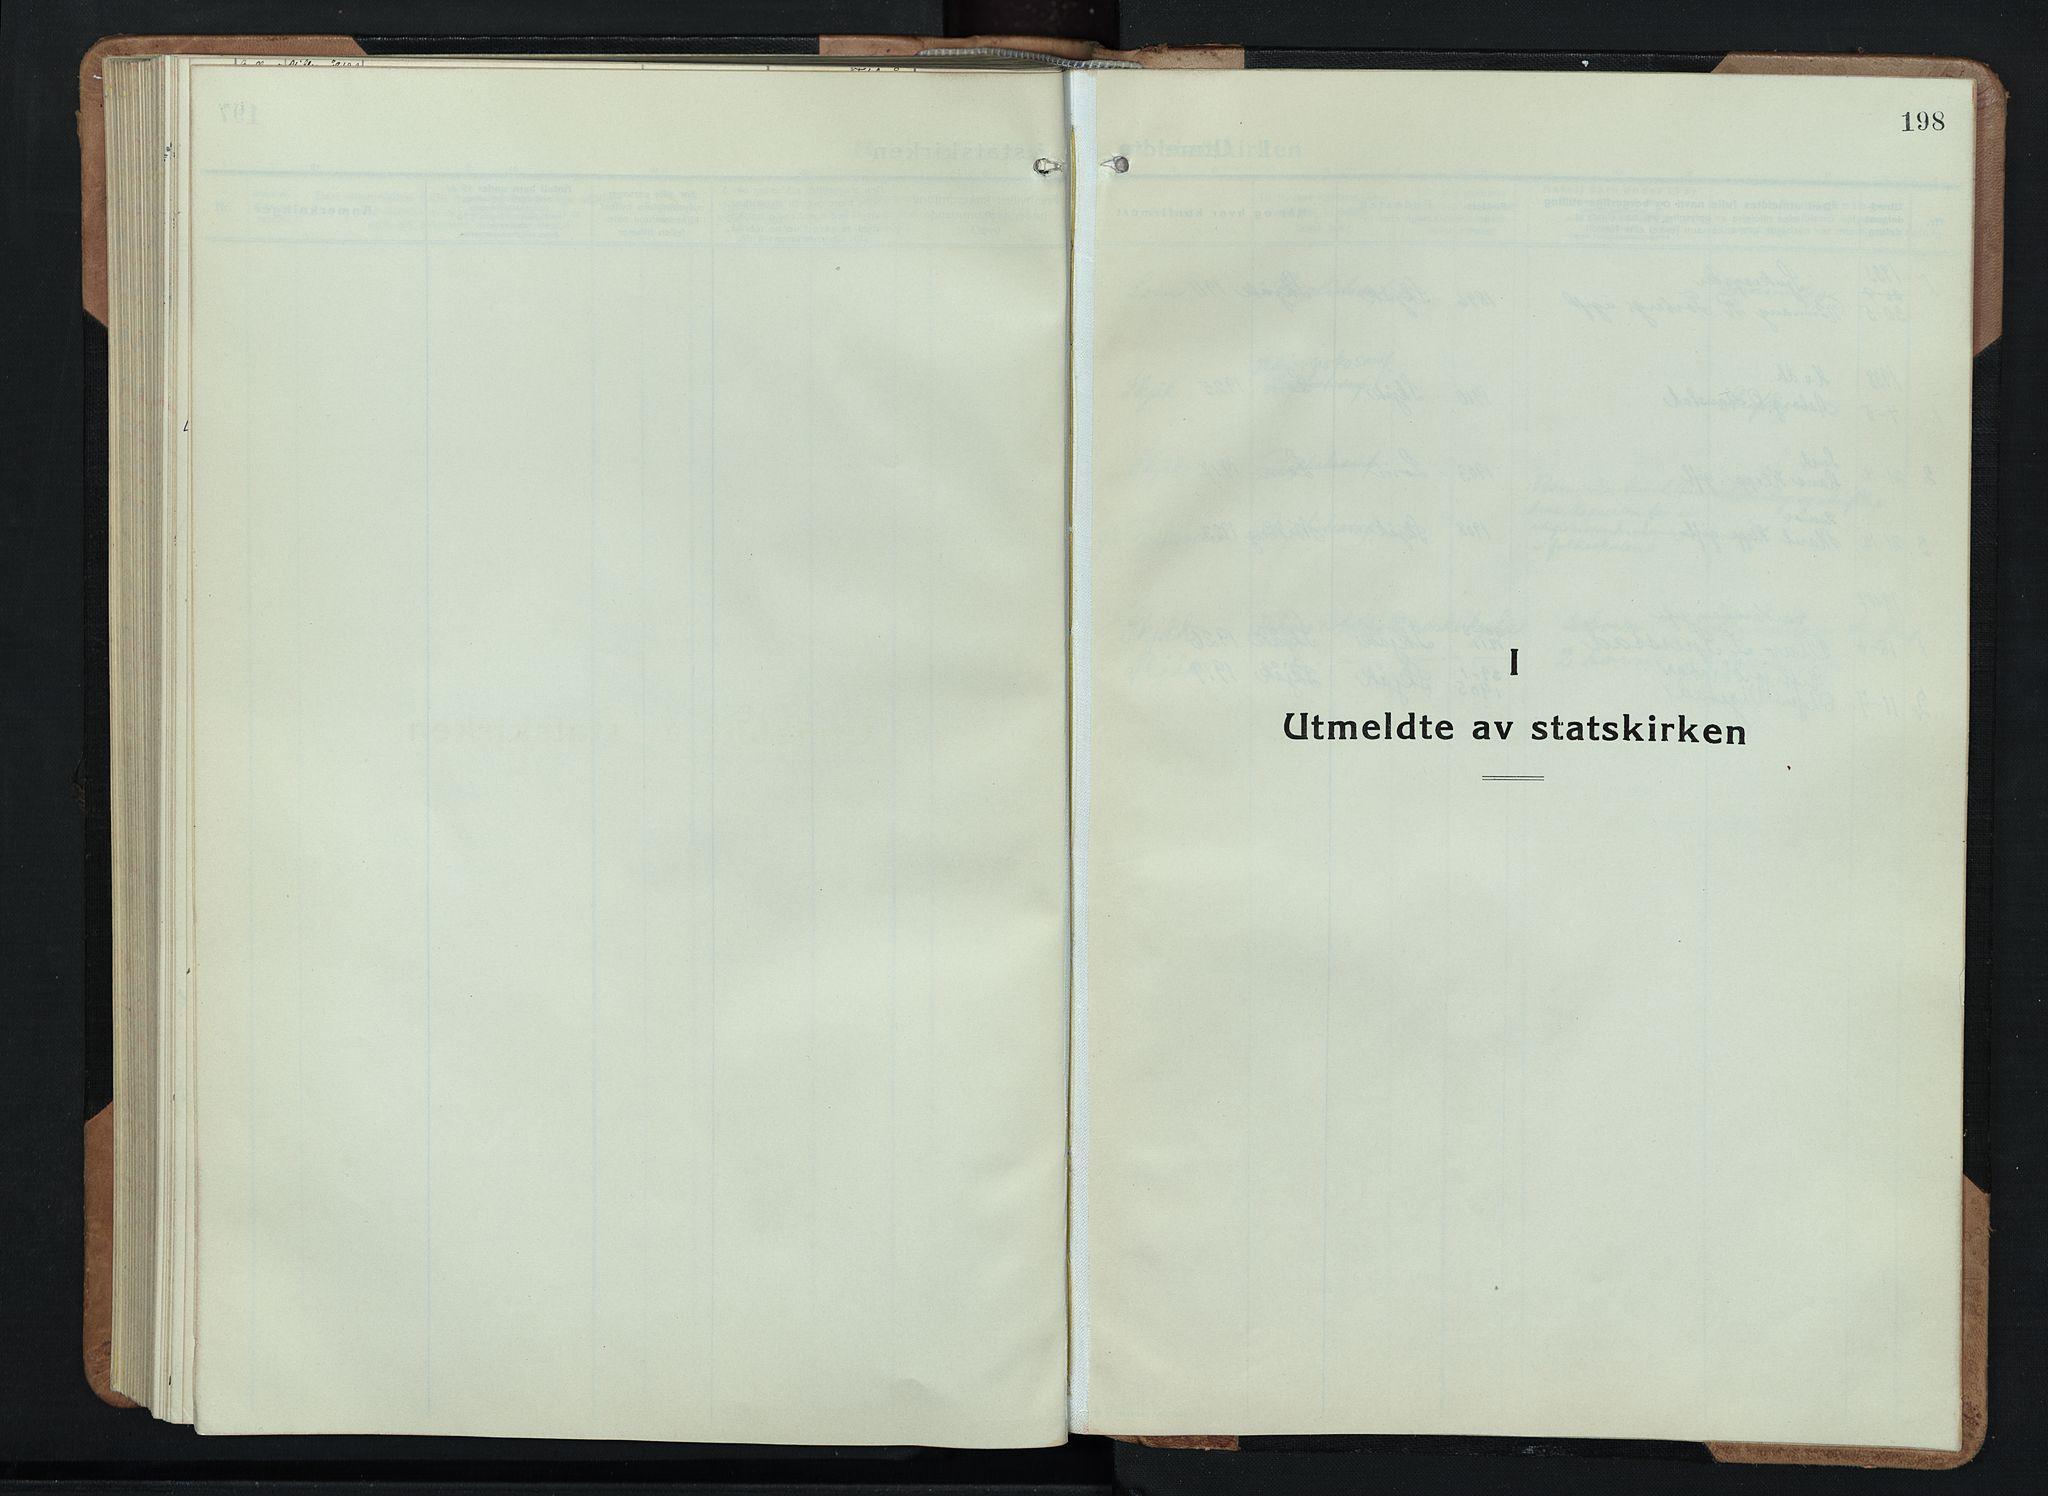 SAH, Skjåk prestekontor, Klokkerbok nr. 6, 1933-1954, s. 198